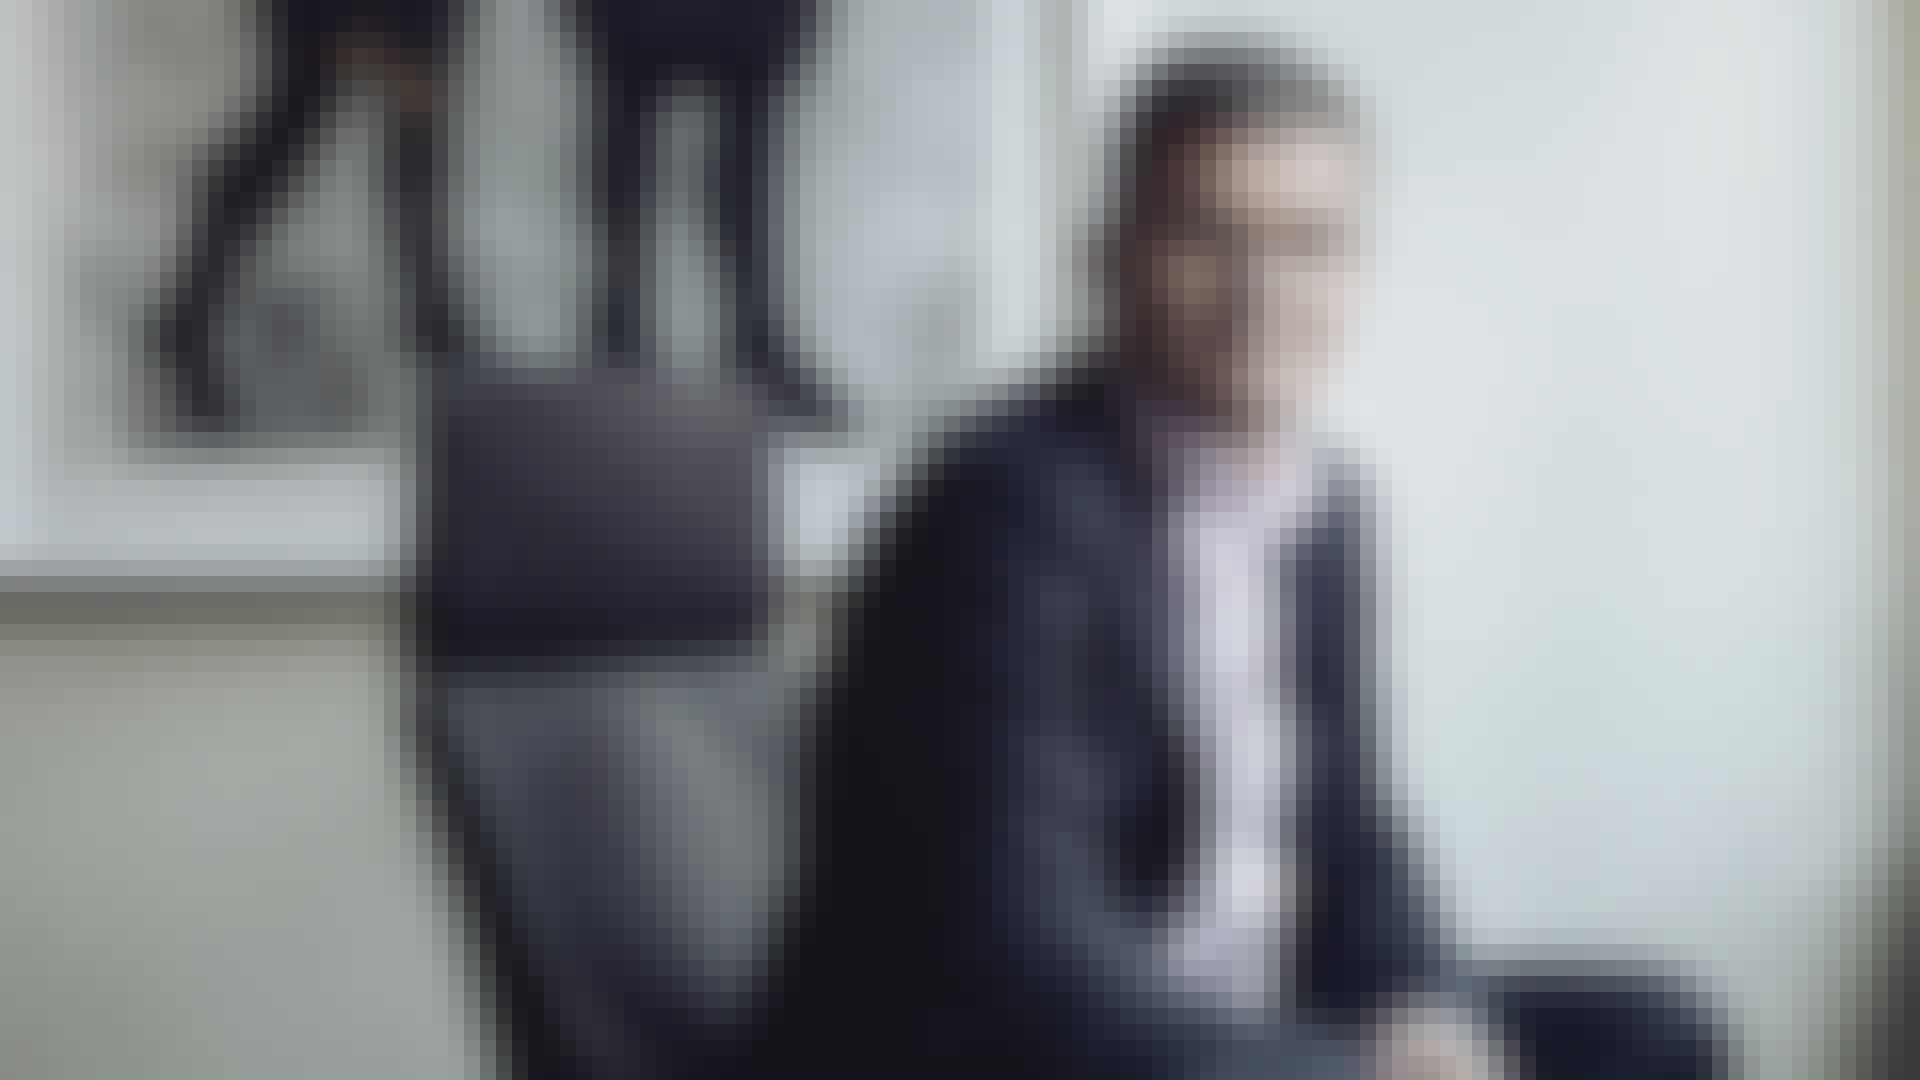 Göran sittande